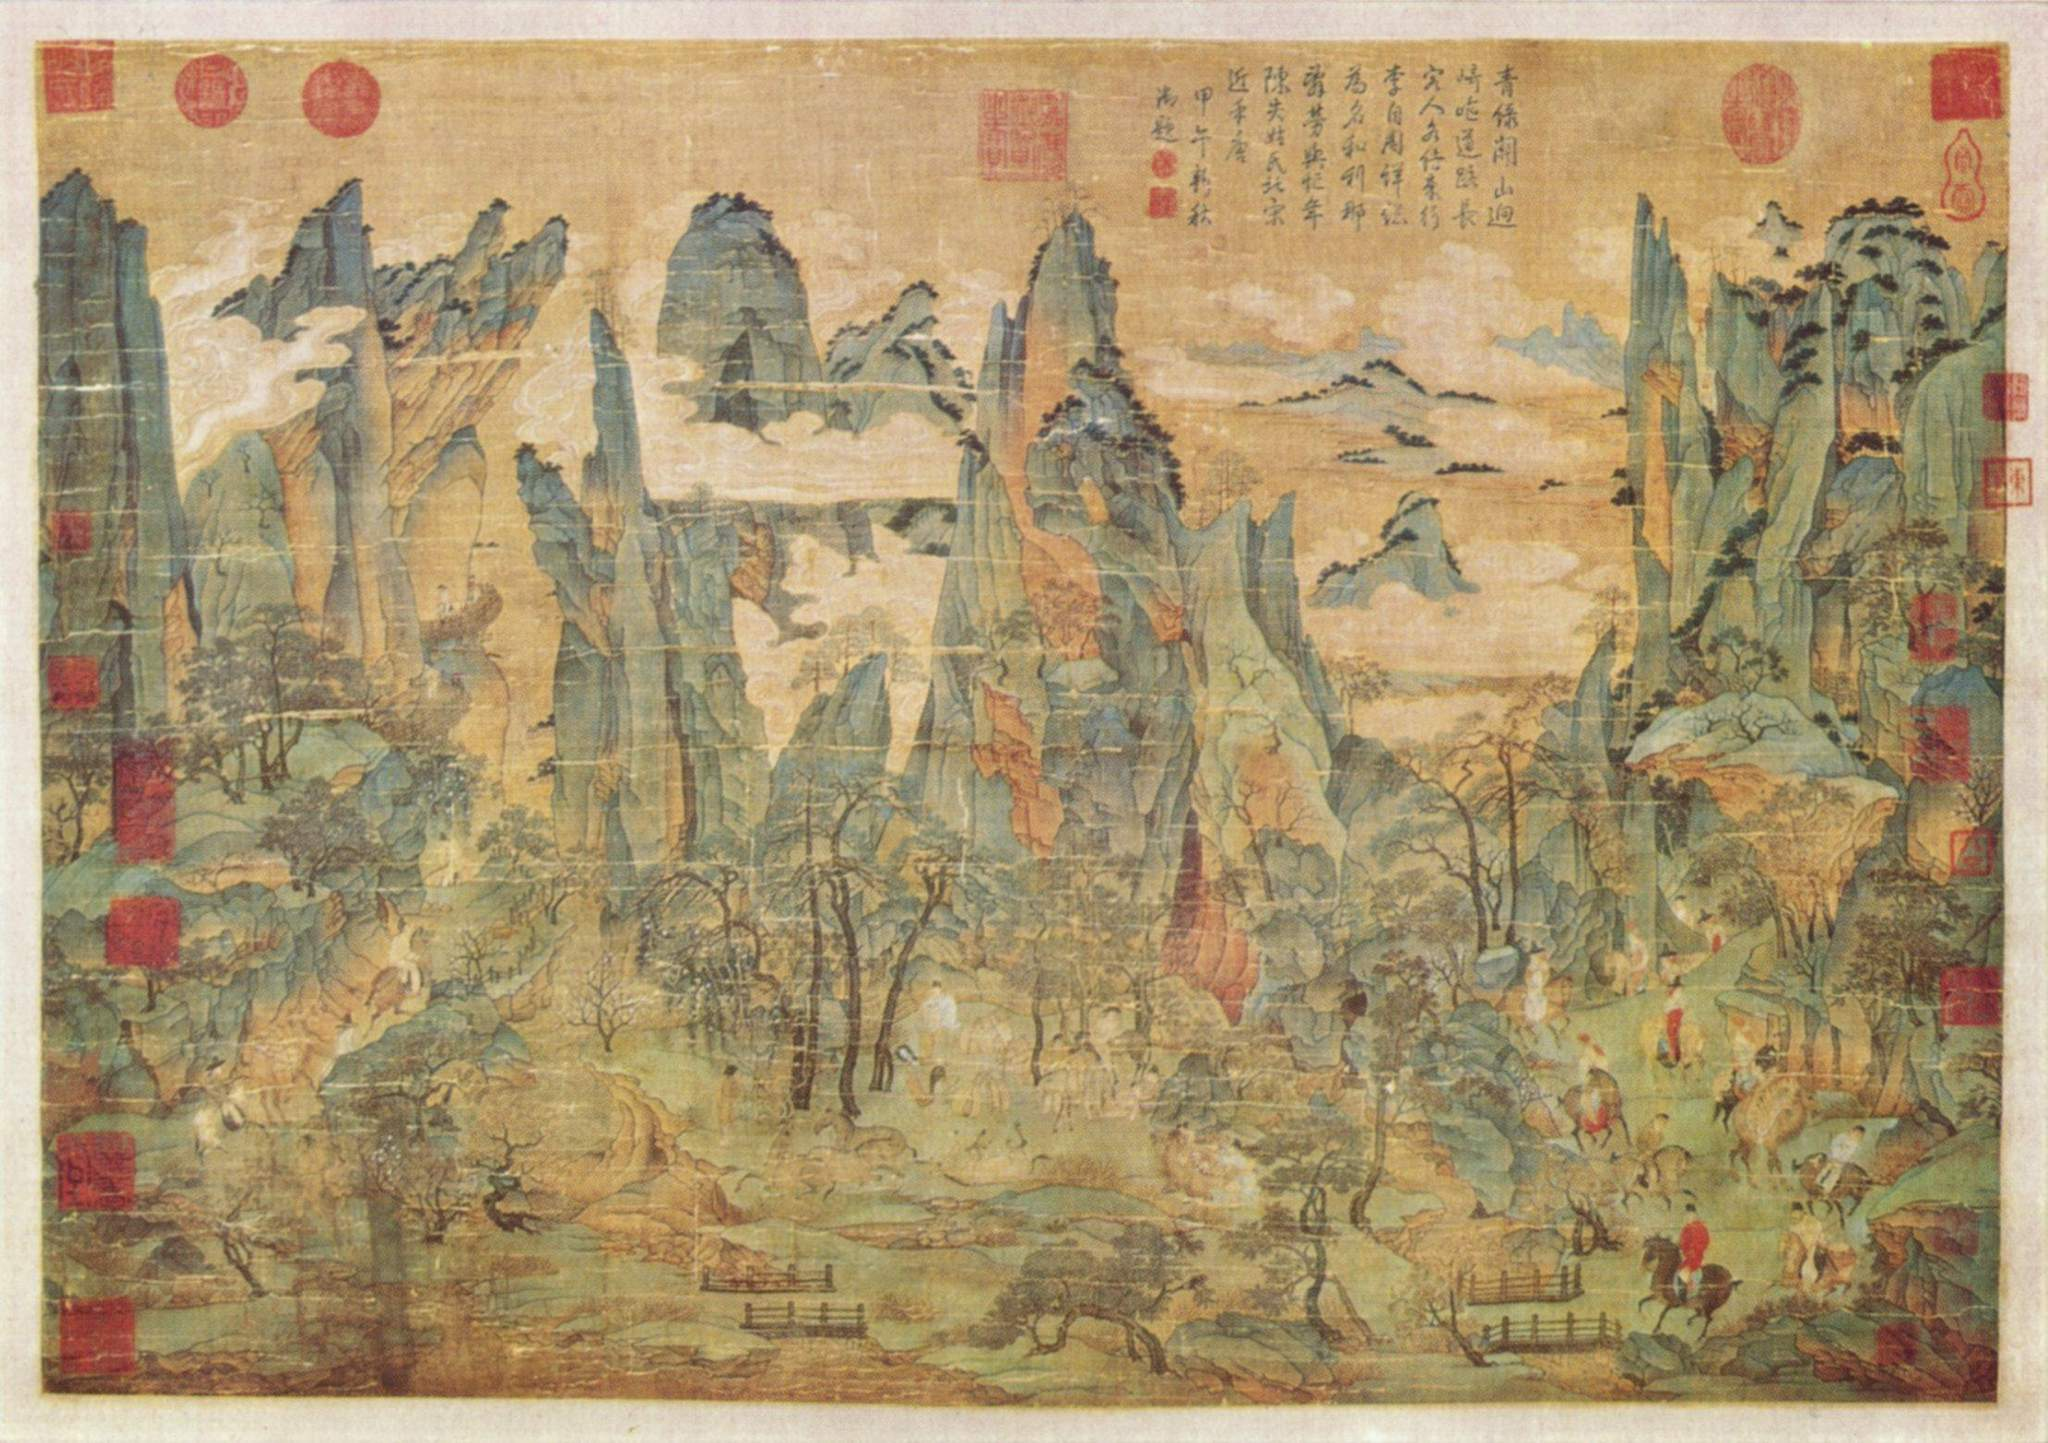 tang dynasty times: Silk Road Diplomacy